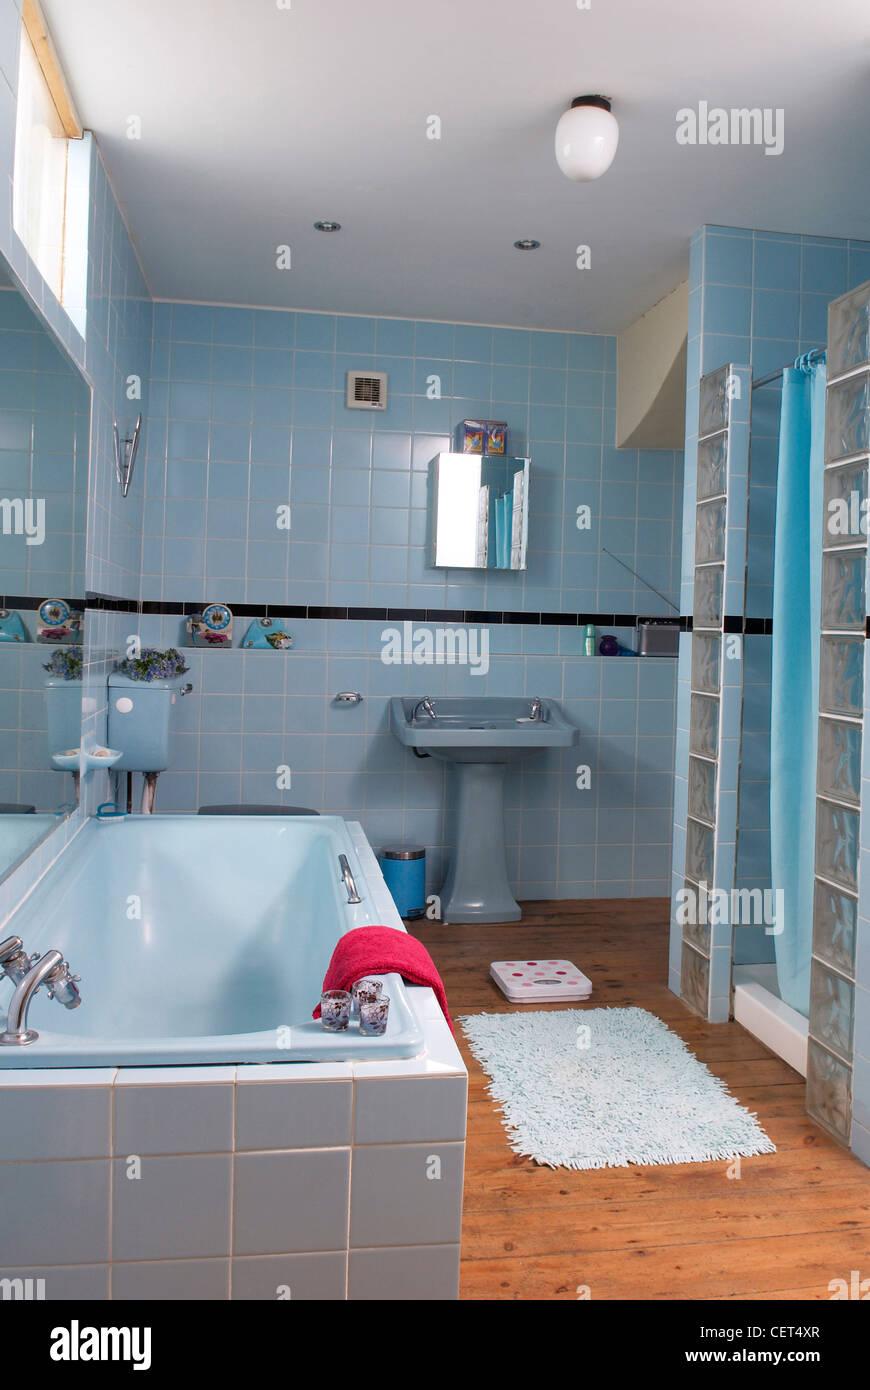 Brighton Interior Interiimage of bathroom blue tiled walls, blue ...